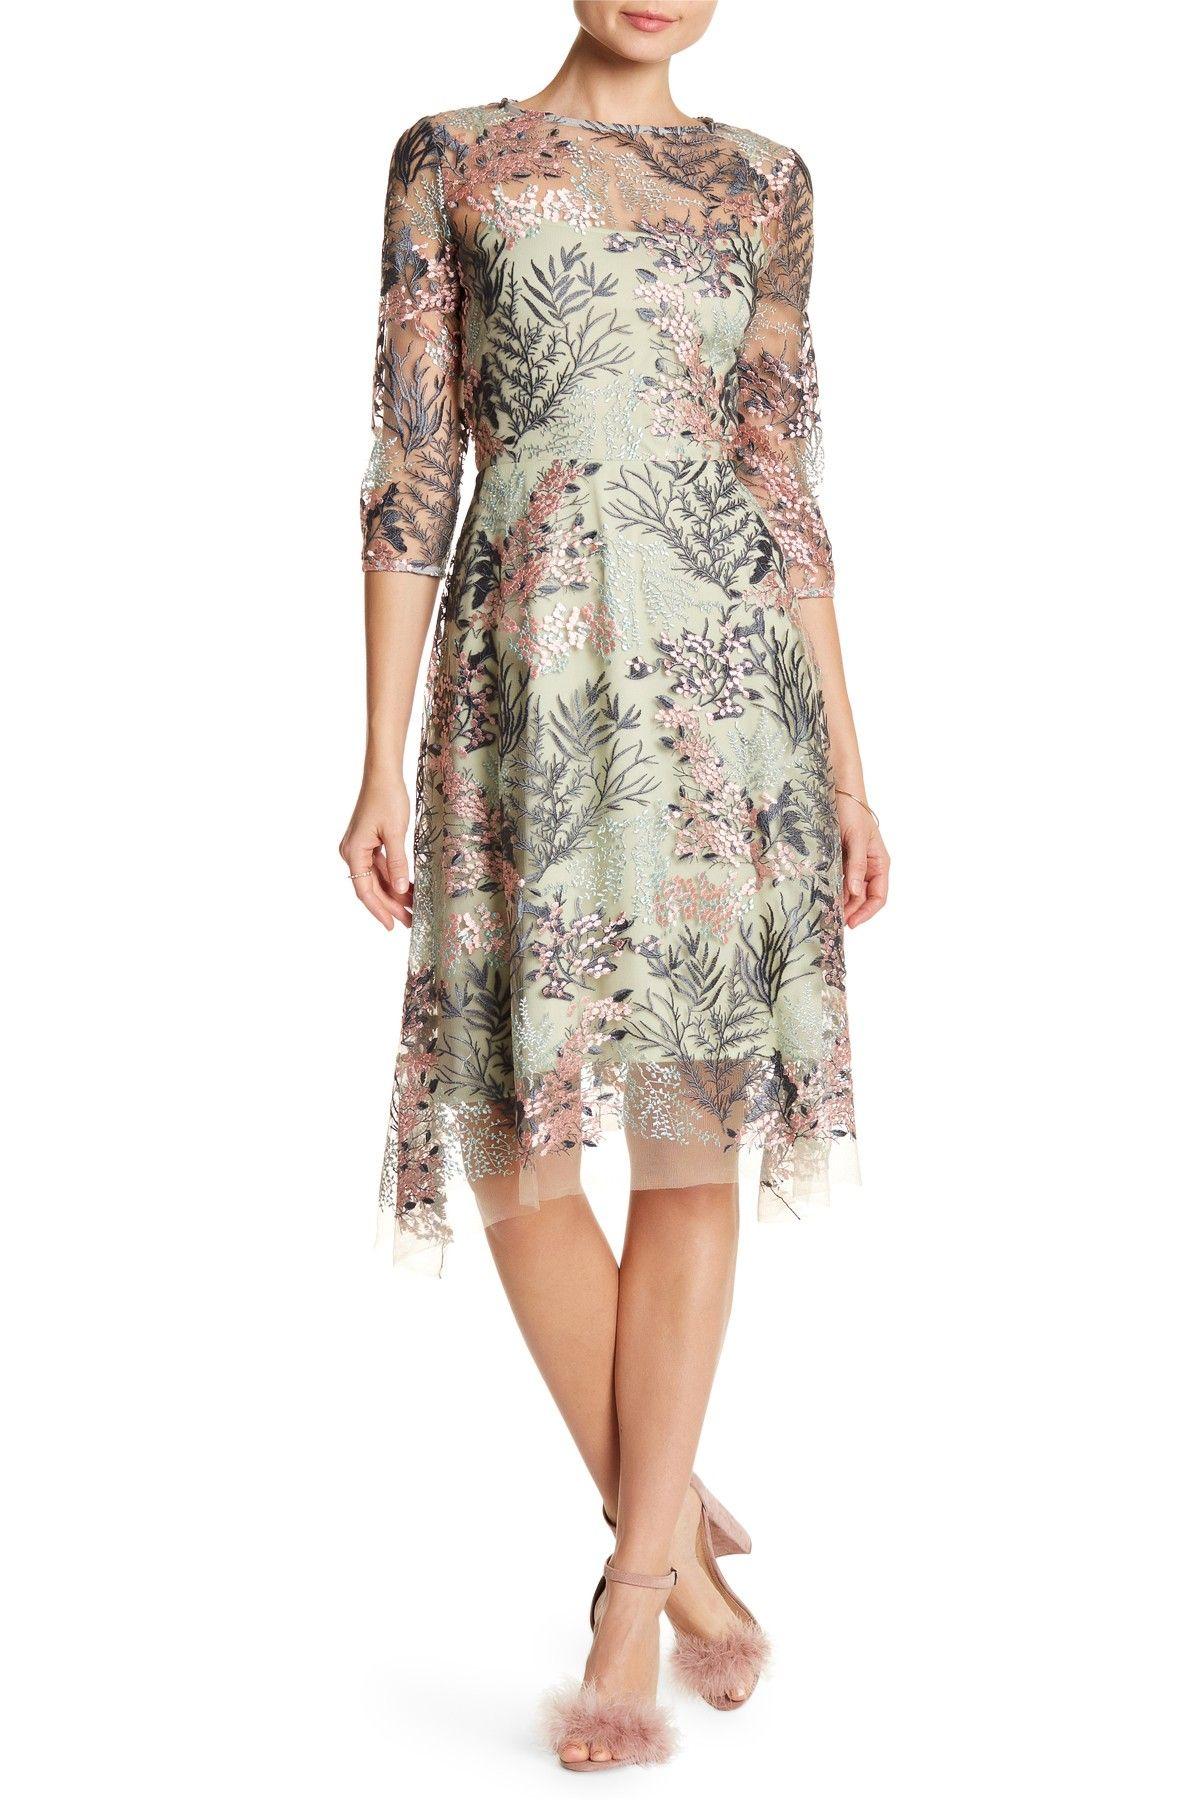 aa15d79010a Eva Franco Esmerelda Embroidered Dress